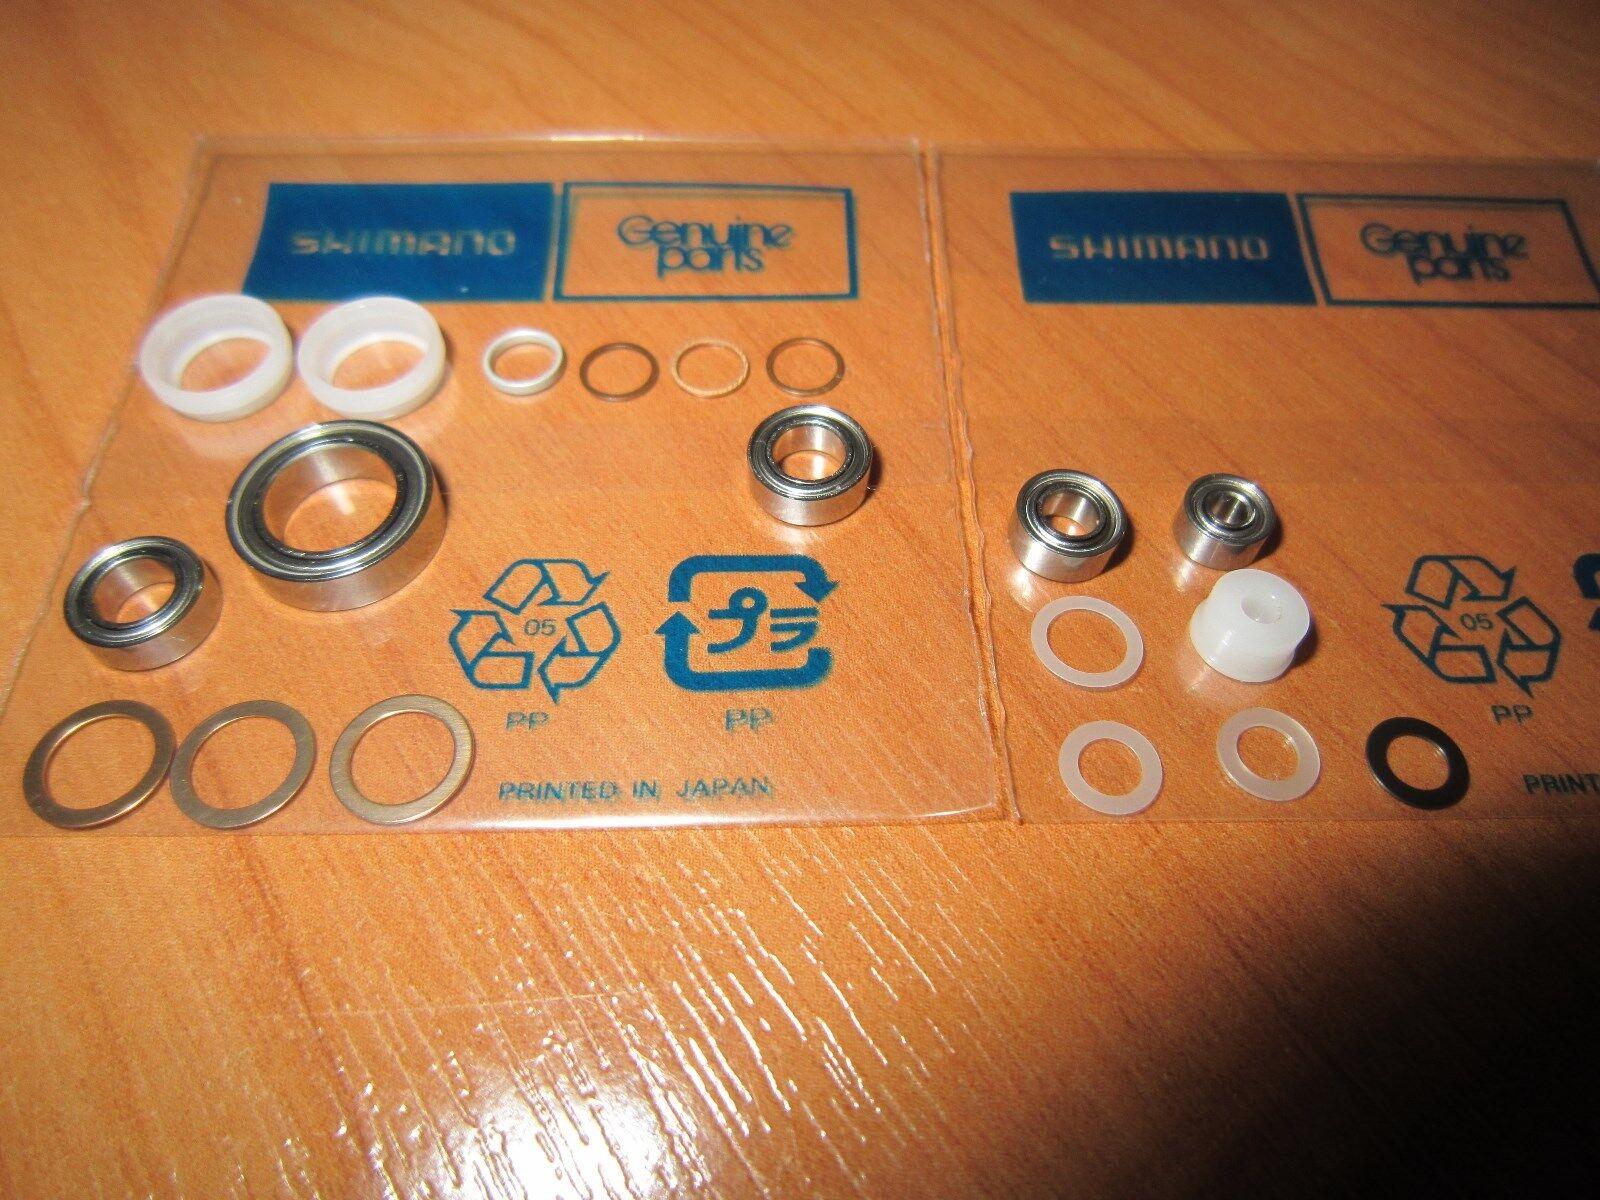 Shimano Complex BB 2500 F4 F6 Full Upgrade Ball Bearing 5bb Upgrade Full Kit 12 Complex BB cc0a1a